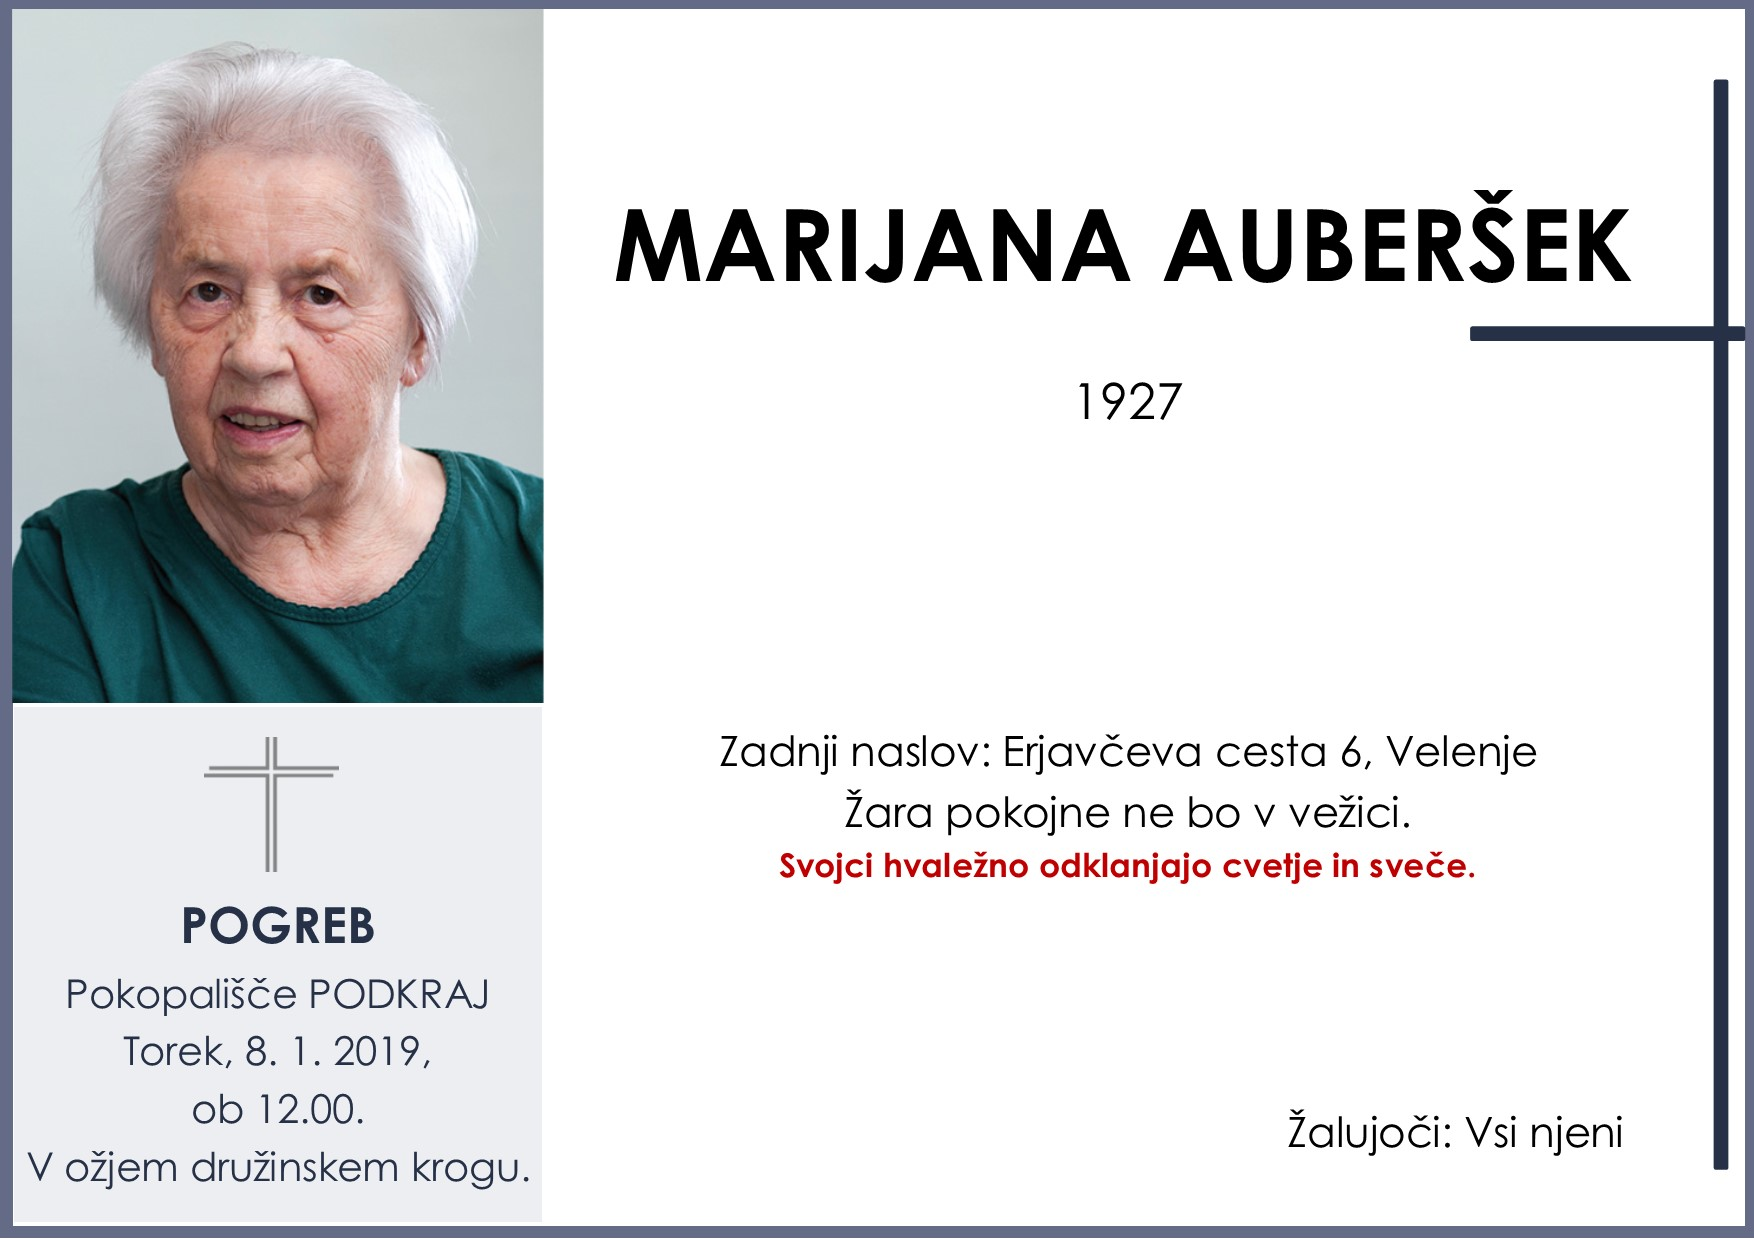 MARIJANA AUBERŠEK, Podkraj, 08. 01. 2019